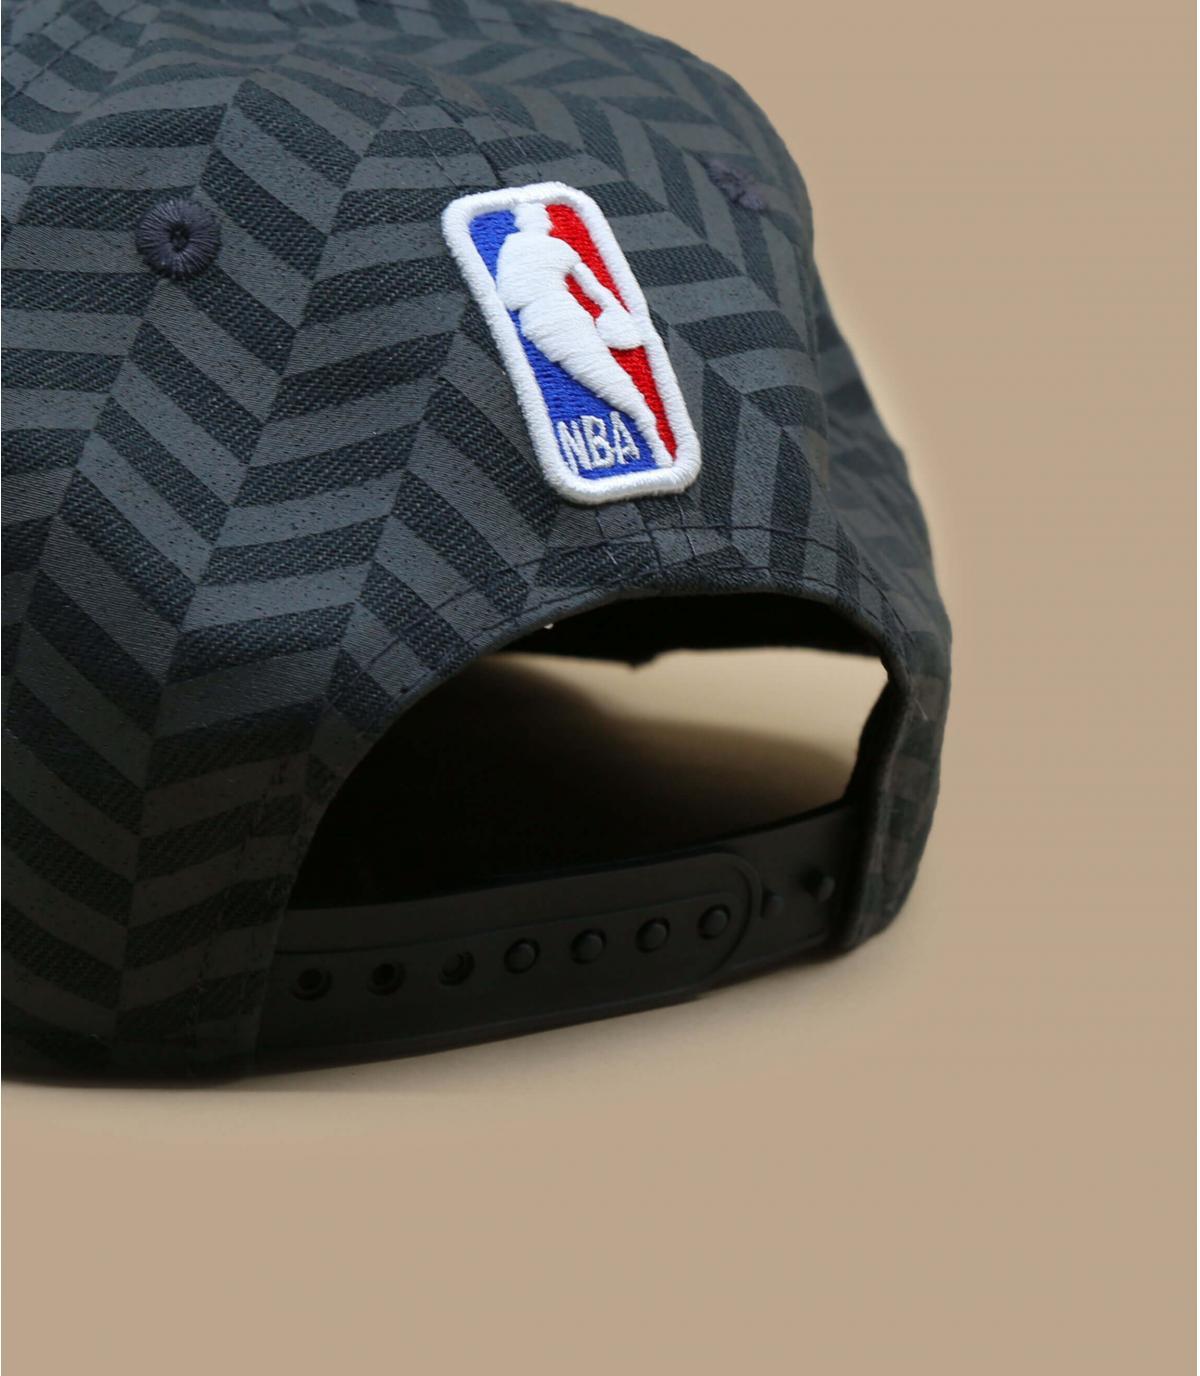 Détails NBA City Series 950 Brooklyn Nets - image 4